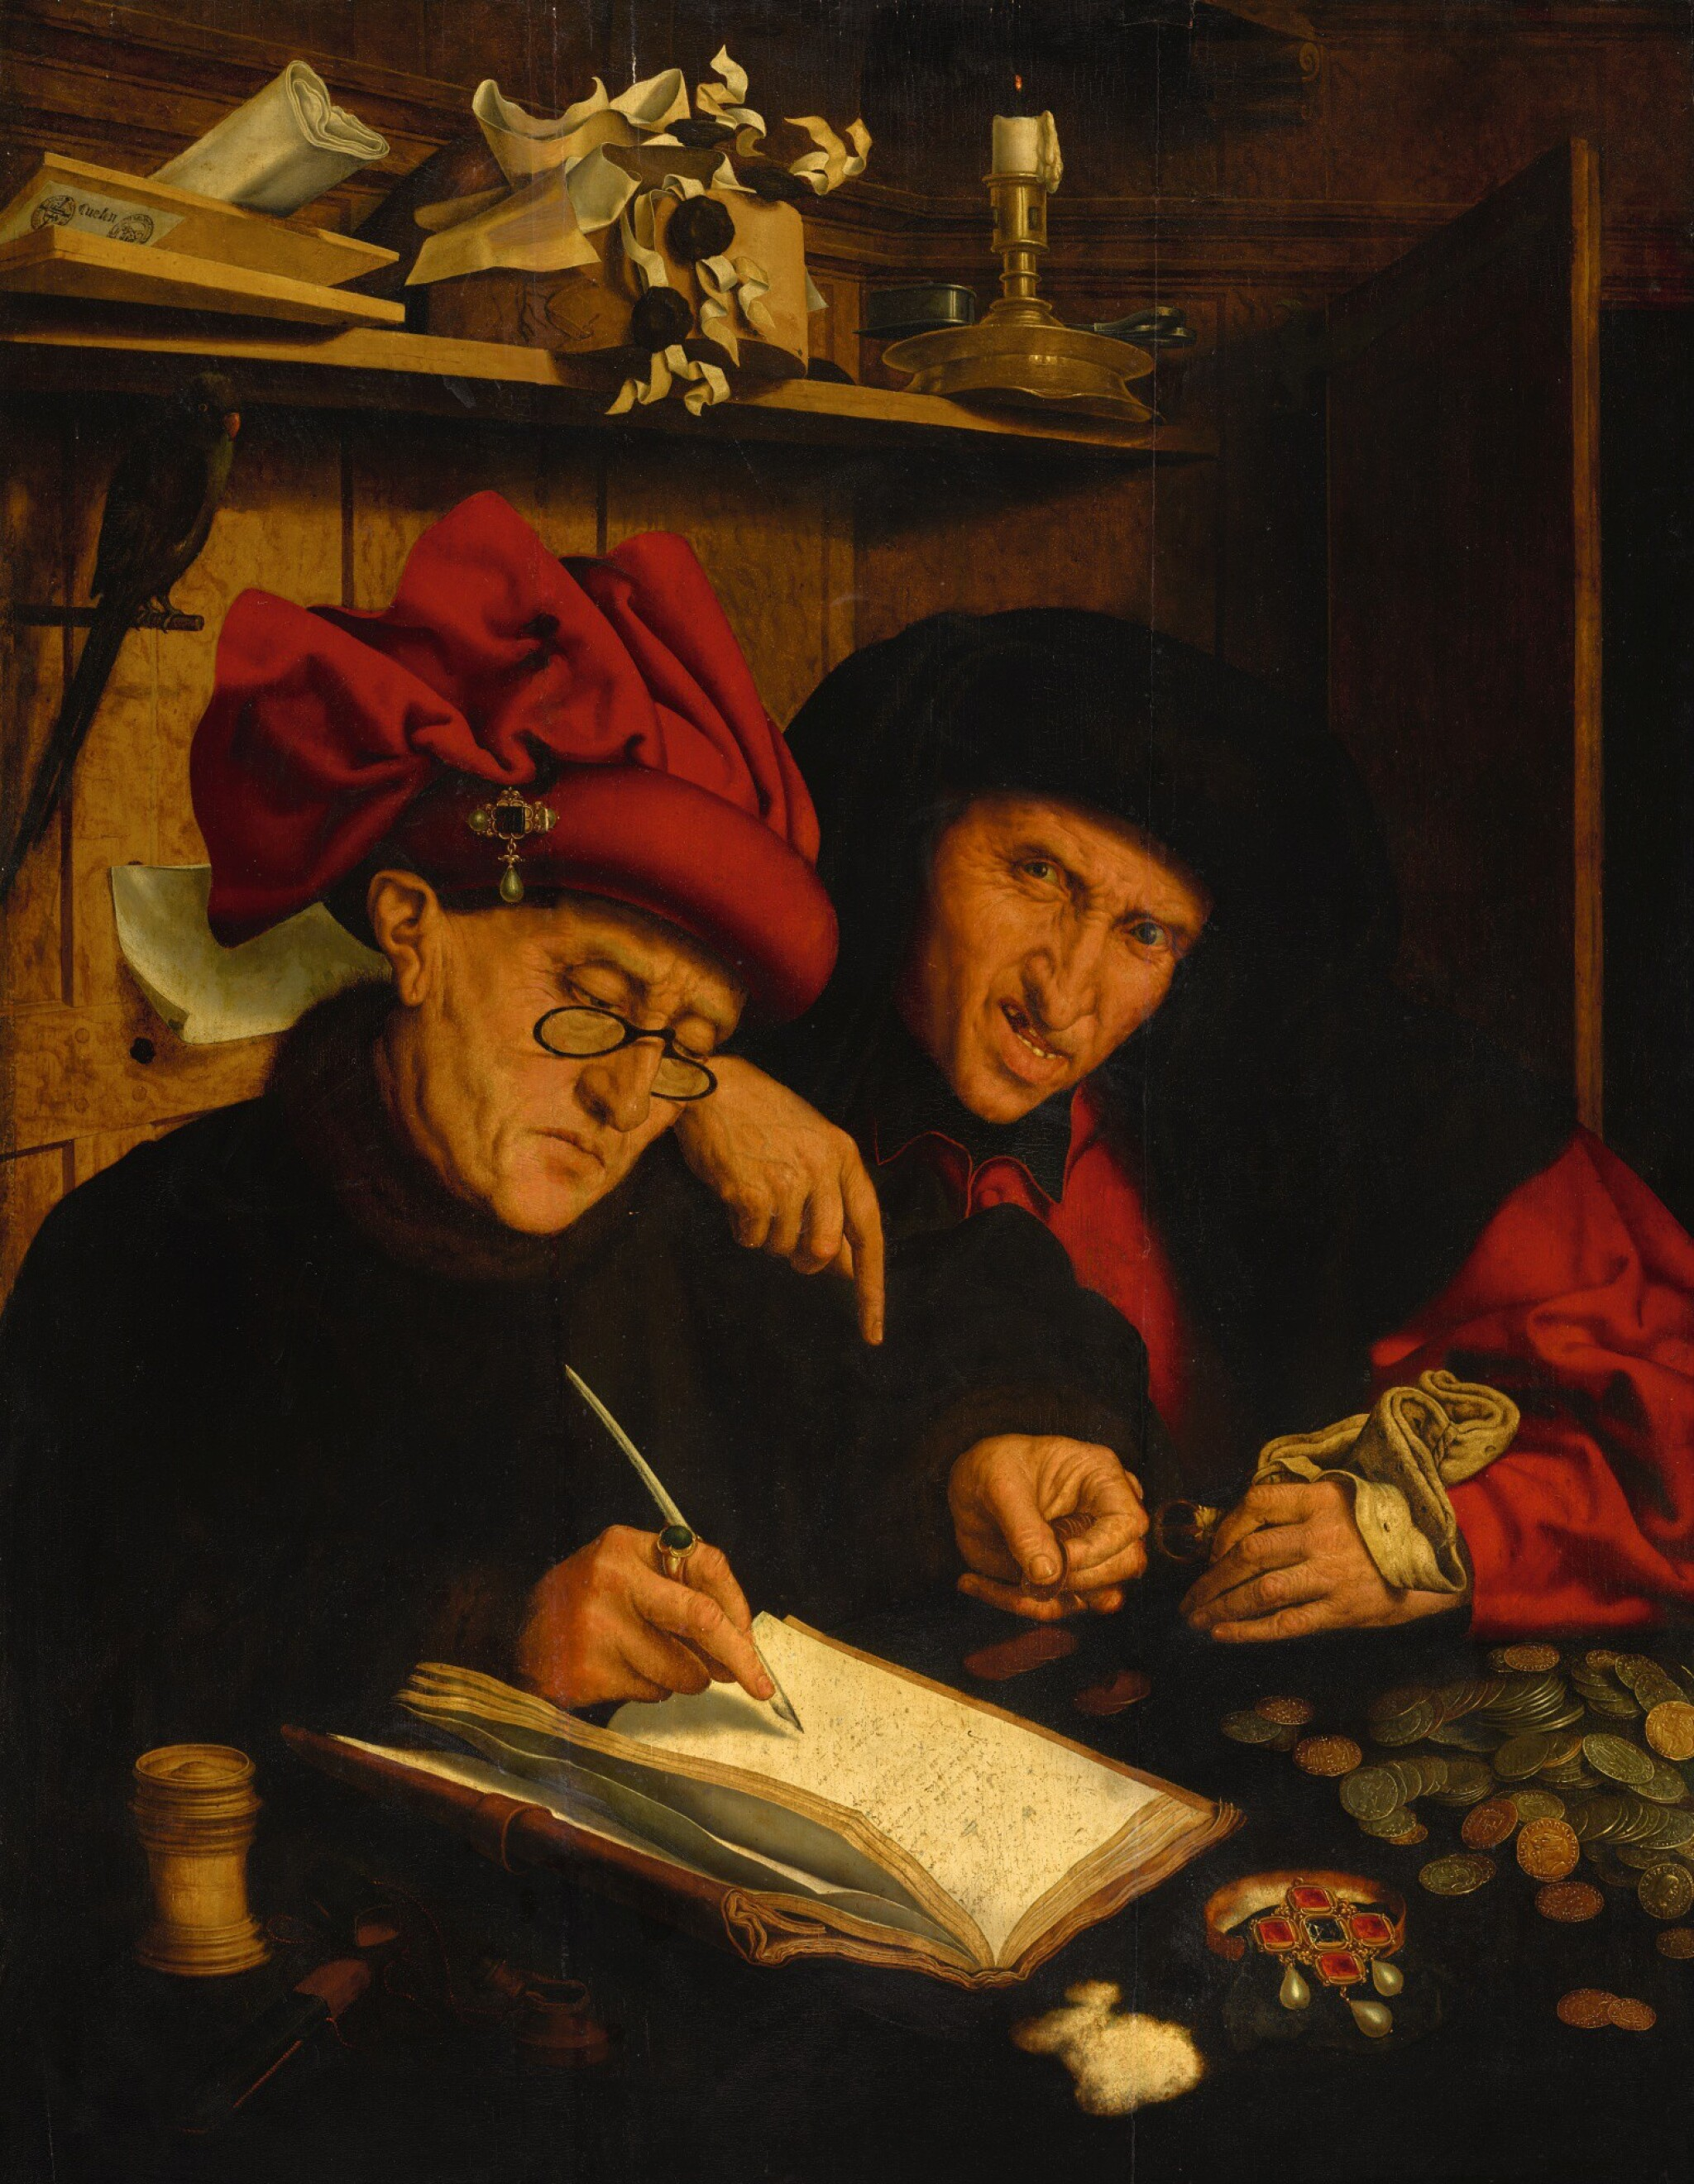 FOLLOWER OF MARINUS VAN REYMERSWAELE | The Tax Collectors or 'The Misers' | 馬里納斯・凡・雷梅爾思維勒之追隨者 | | 《稅吏》或《守財奴》